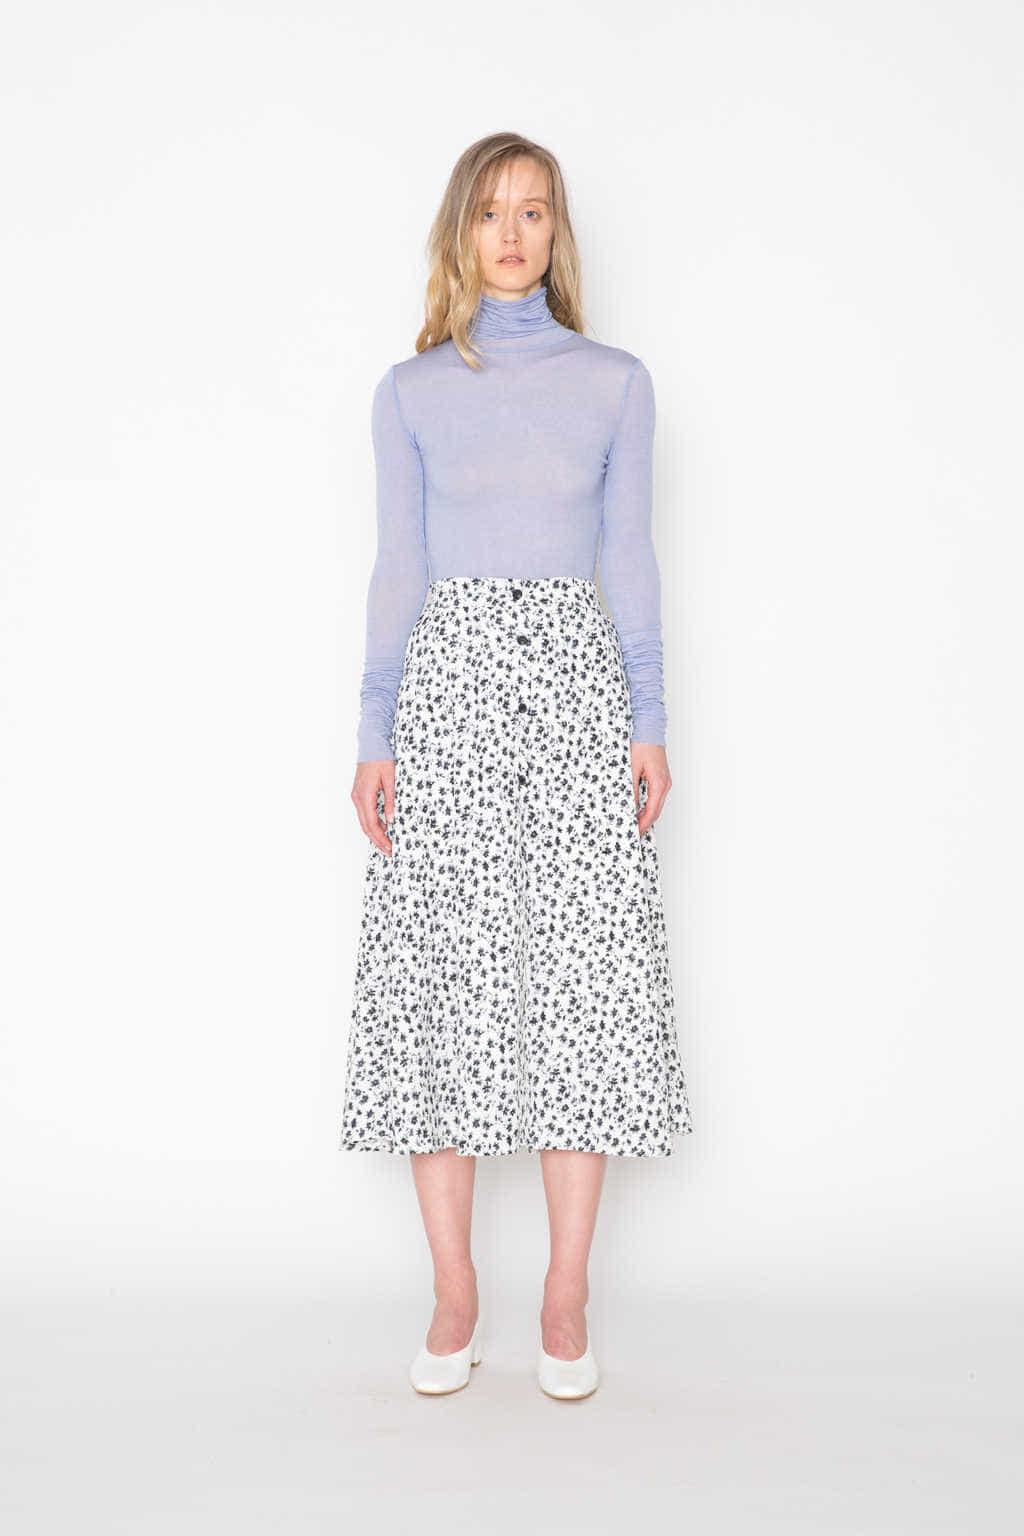 Skirt H214 Cream 3